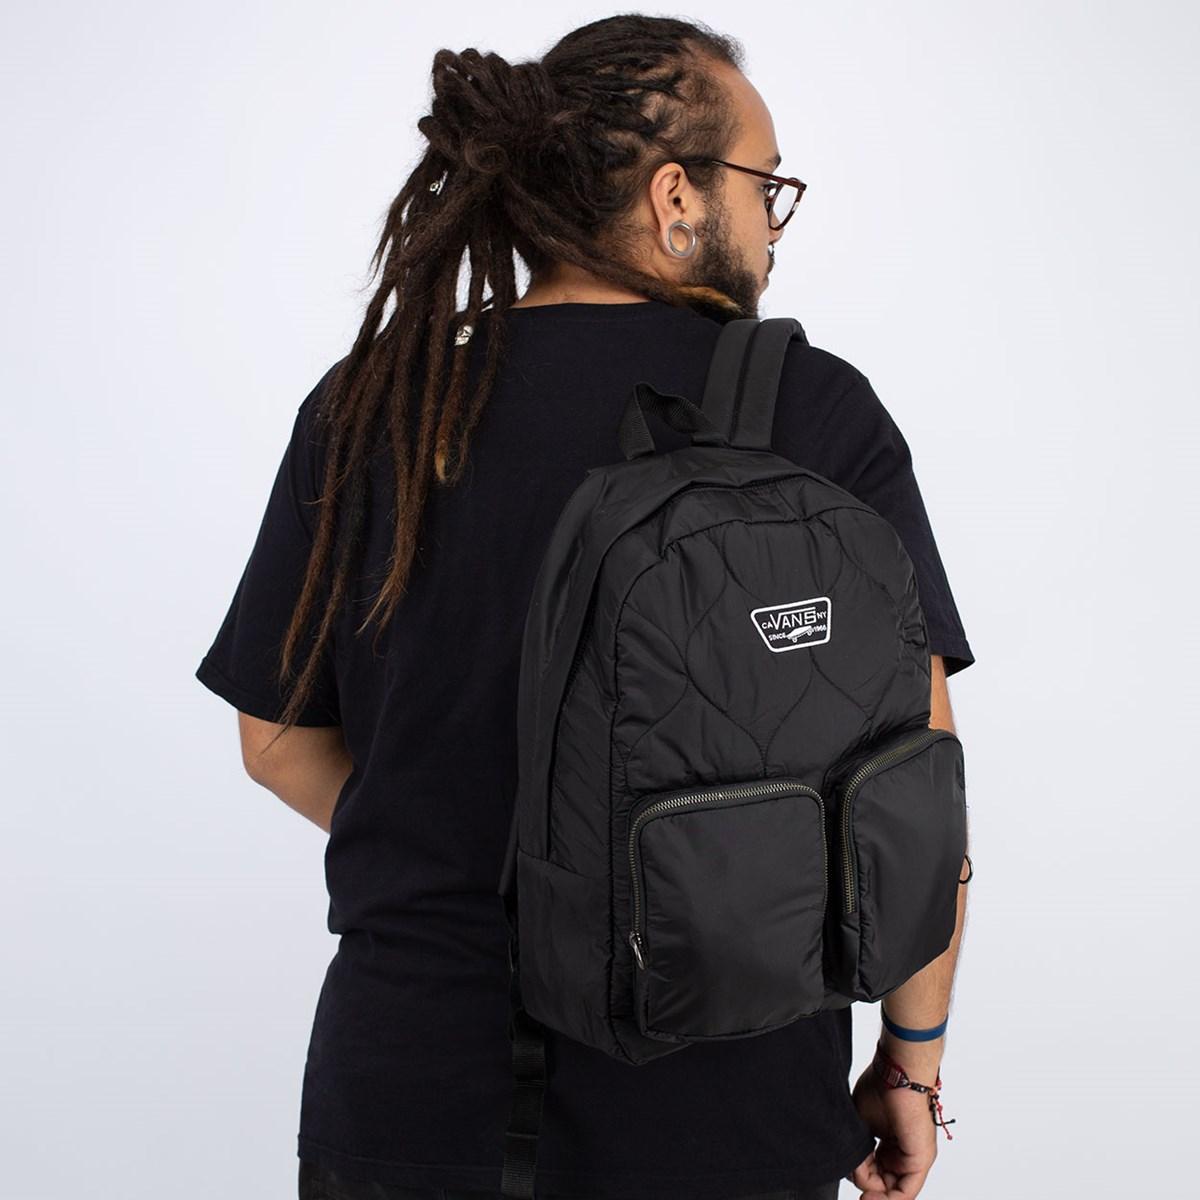 Mochila Vans Long Haul Backpack Black VN0A4S6XBLK